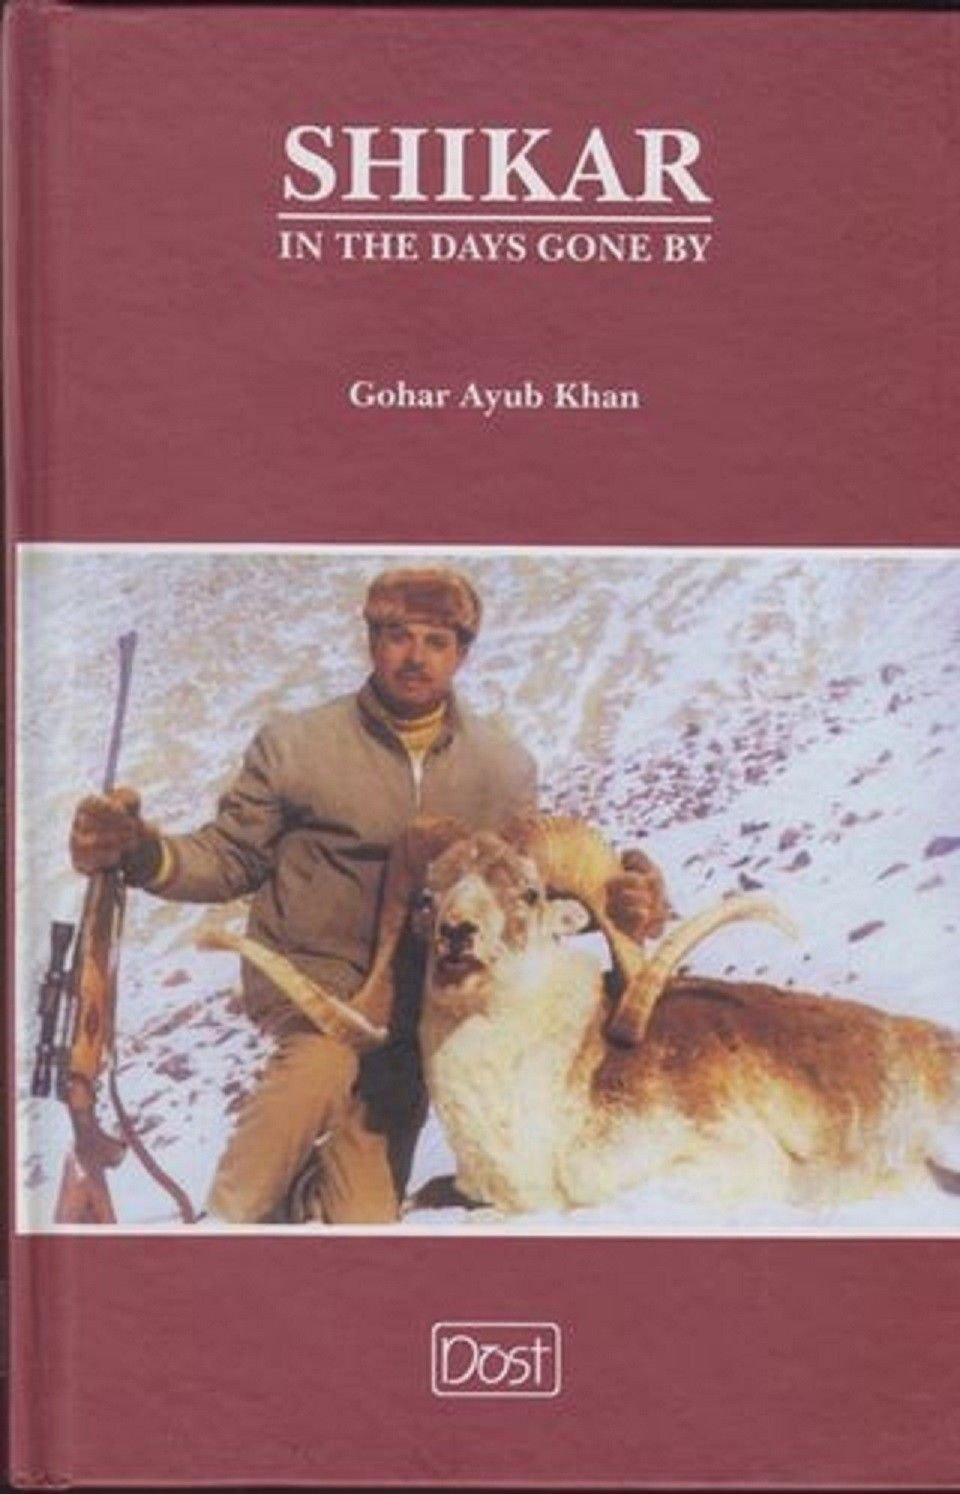 Shikar In The Days Gone By: Gohar Ayub Khan: 9789694963419